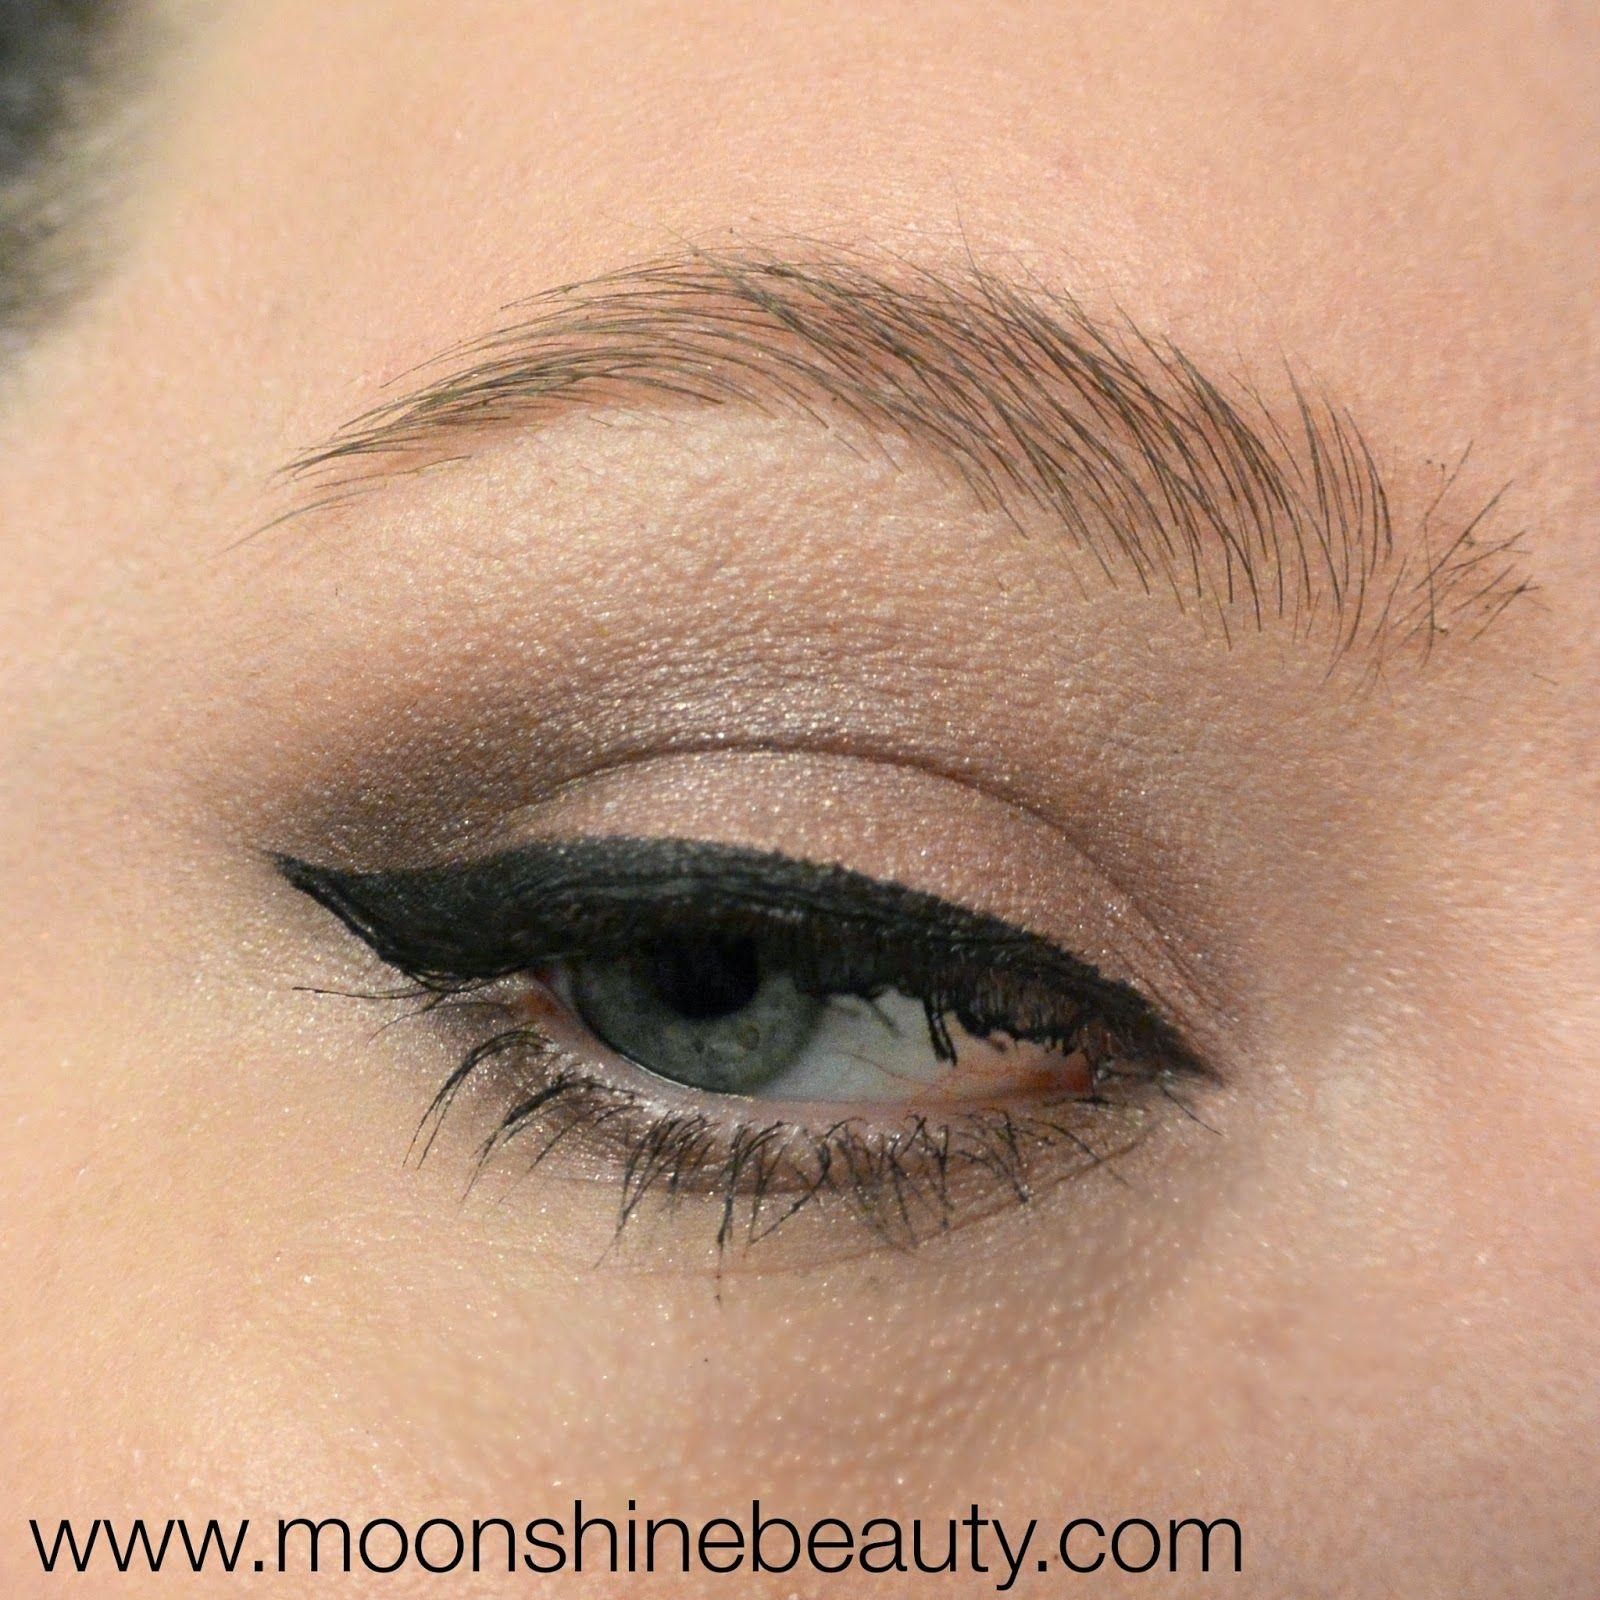 Moonshine Beauty: Budget Beauty -- Will L.A. Girl Fineline Liquid